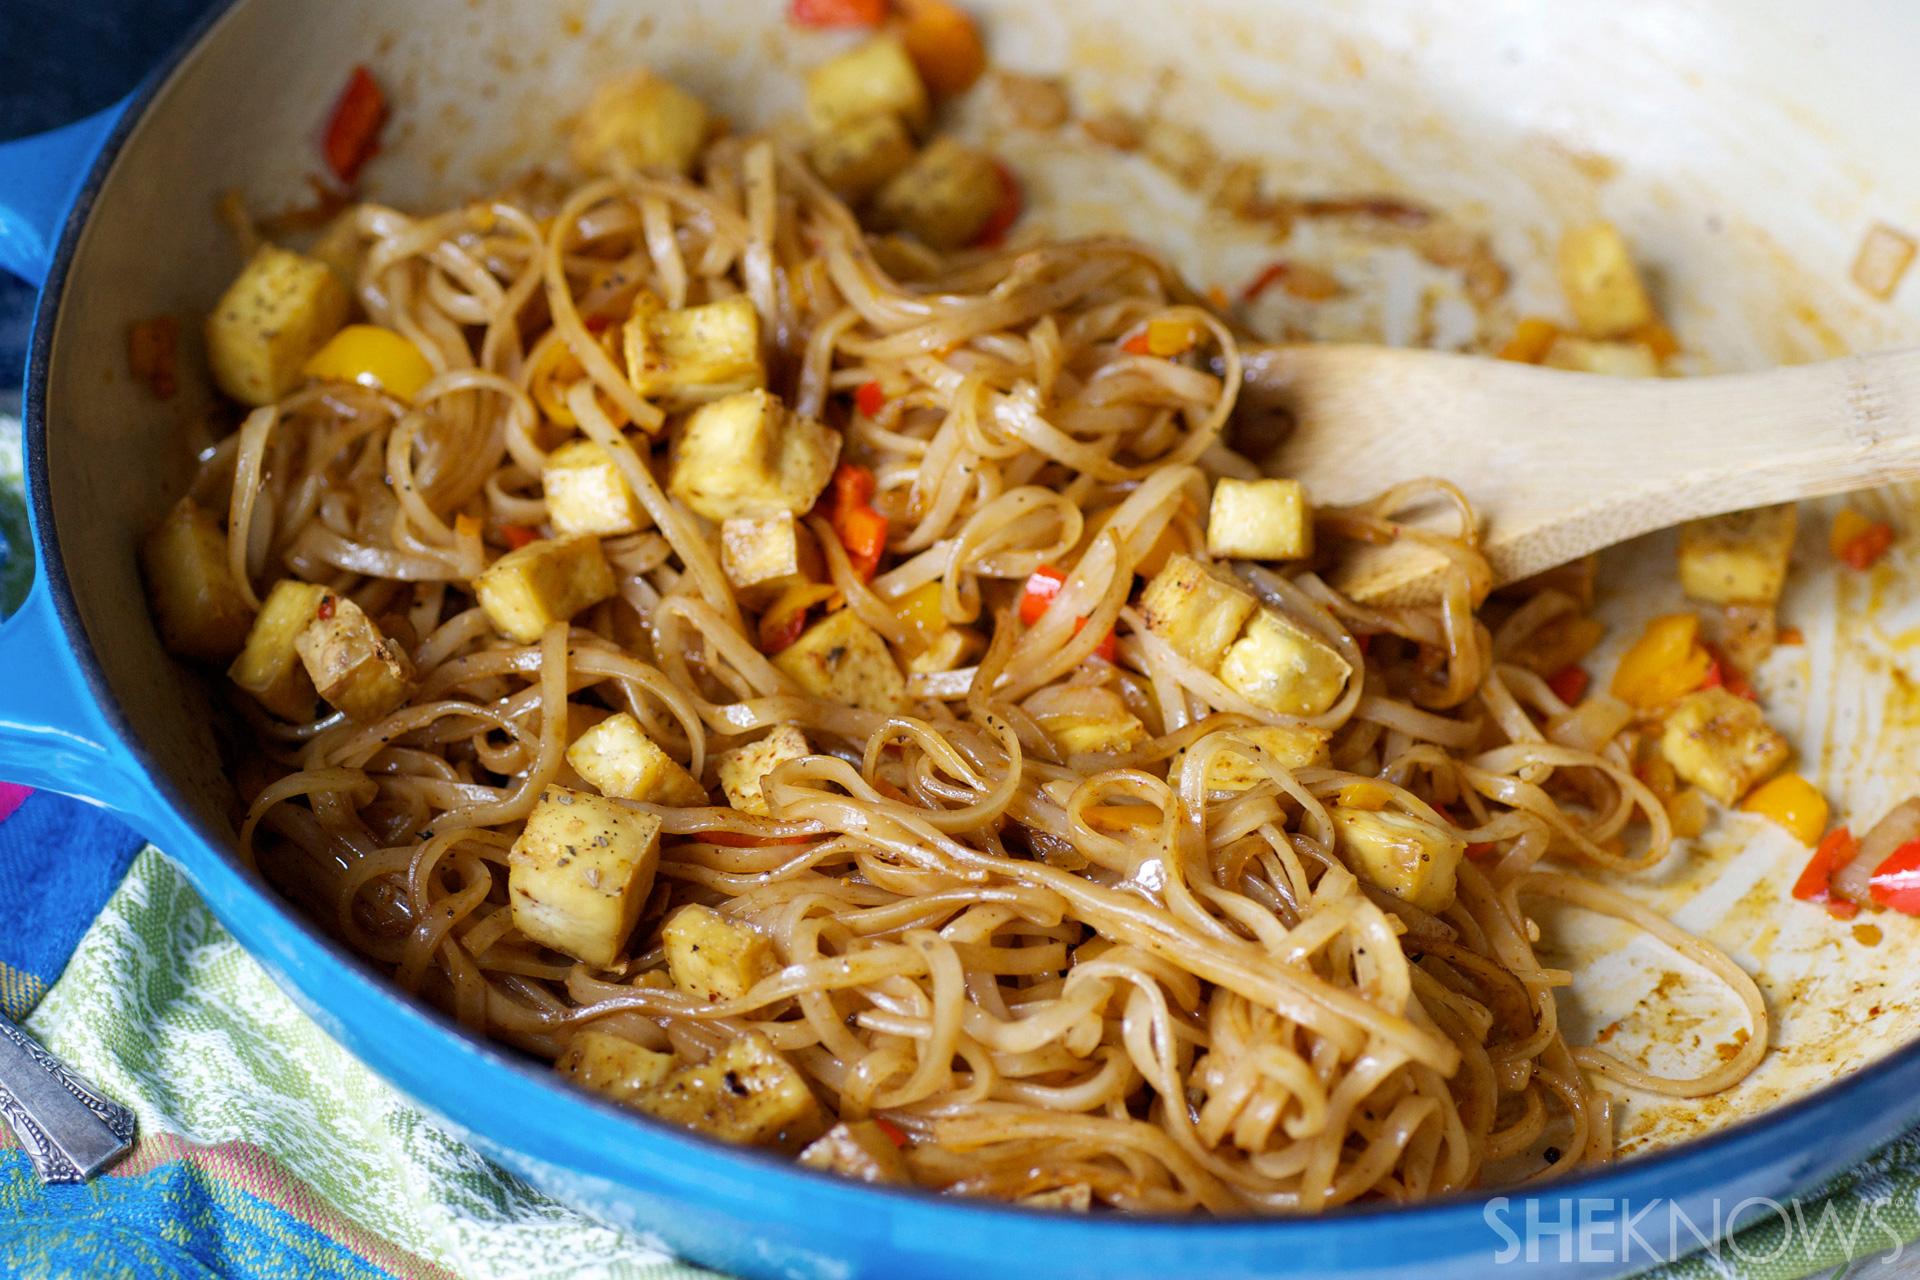 Crispy tofu noodles